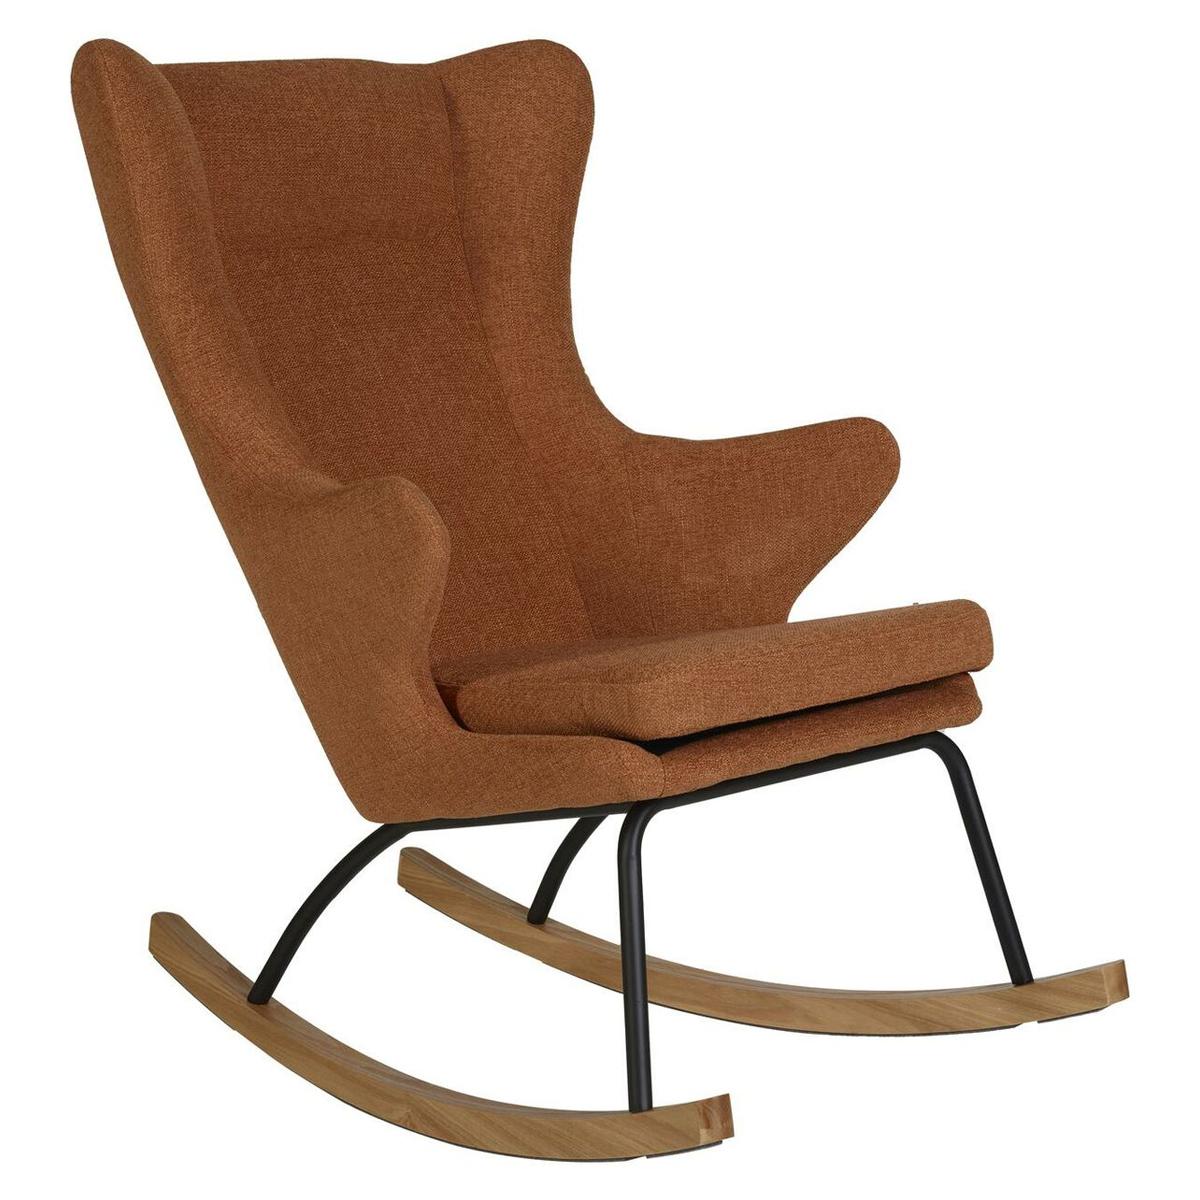 Fauteuil Rocking Adult Chair De Luxe - Terra Rocking Adult Chair De Luxe - Terra